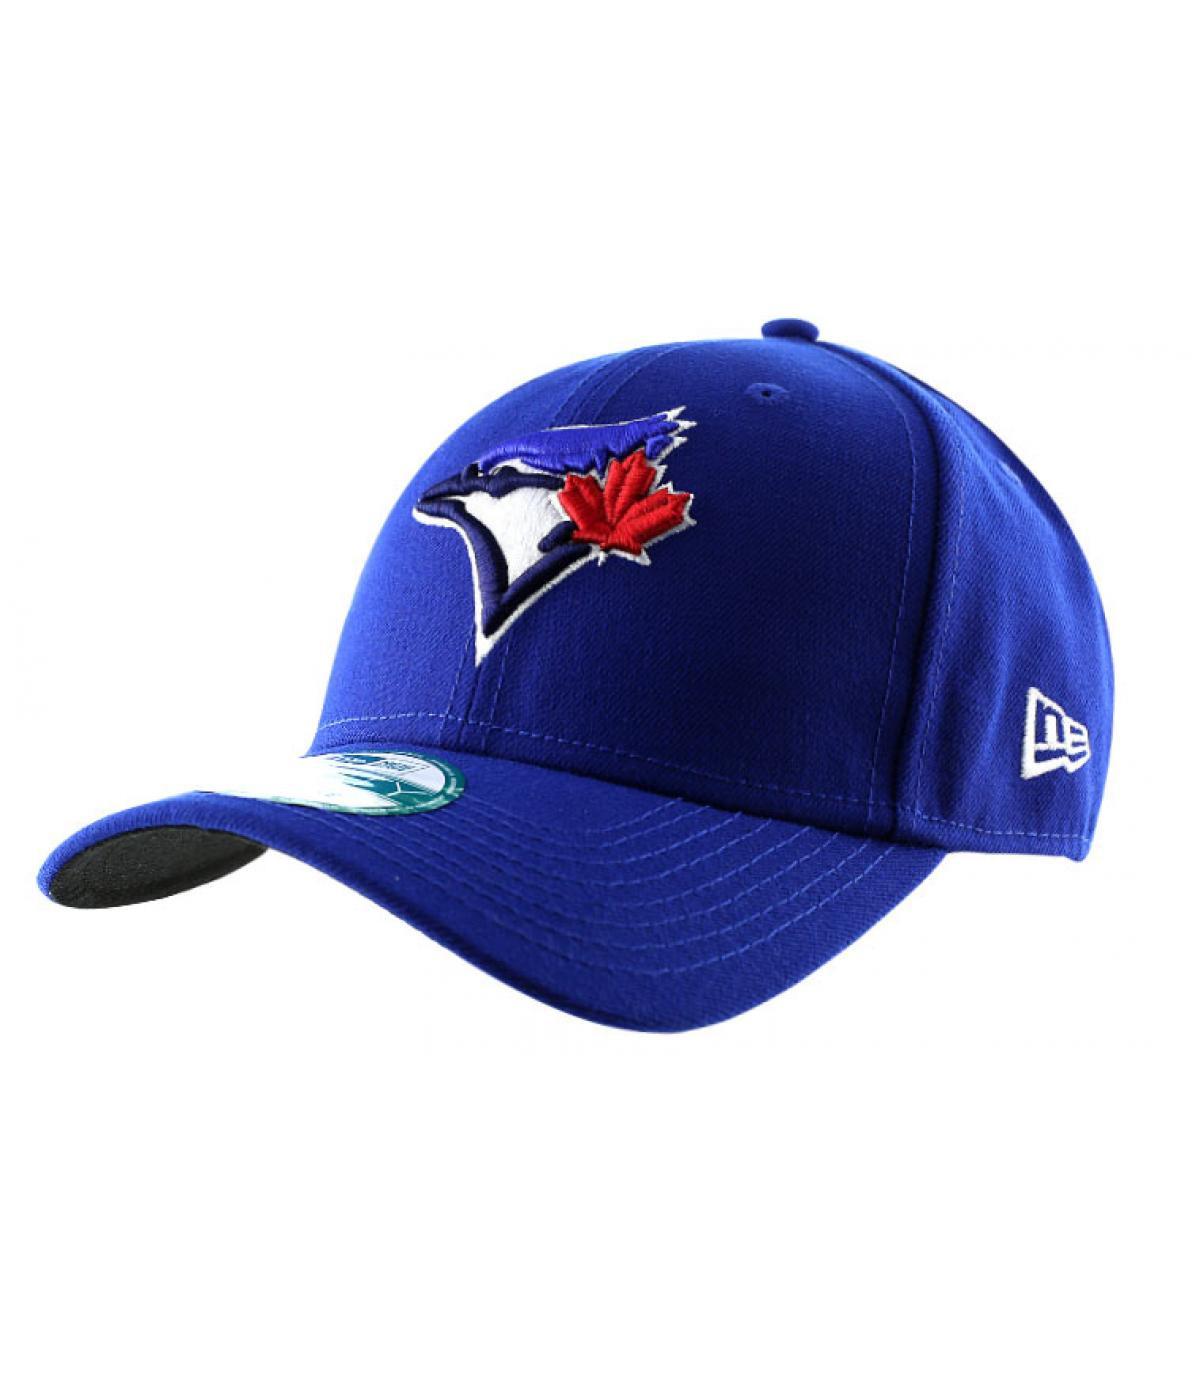 f03b90c991c6e Toronto baseball cap - League 9forty Toronto by New Era. Headict